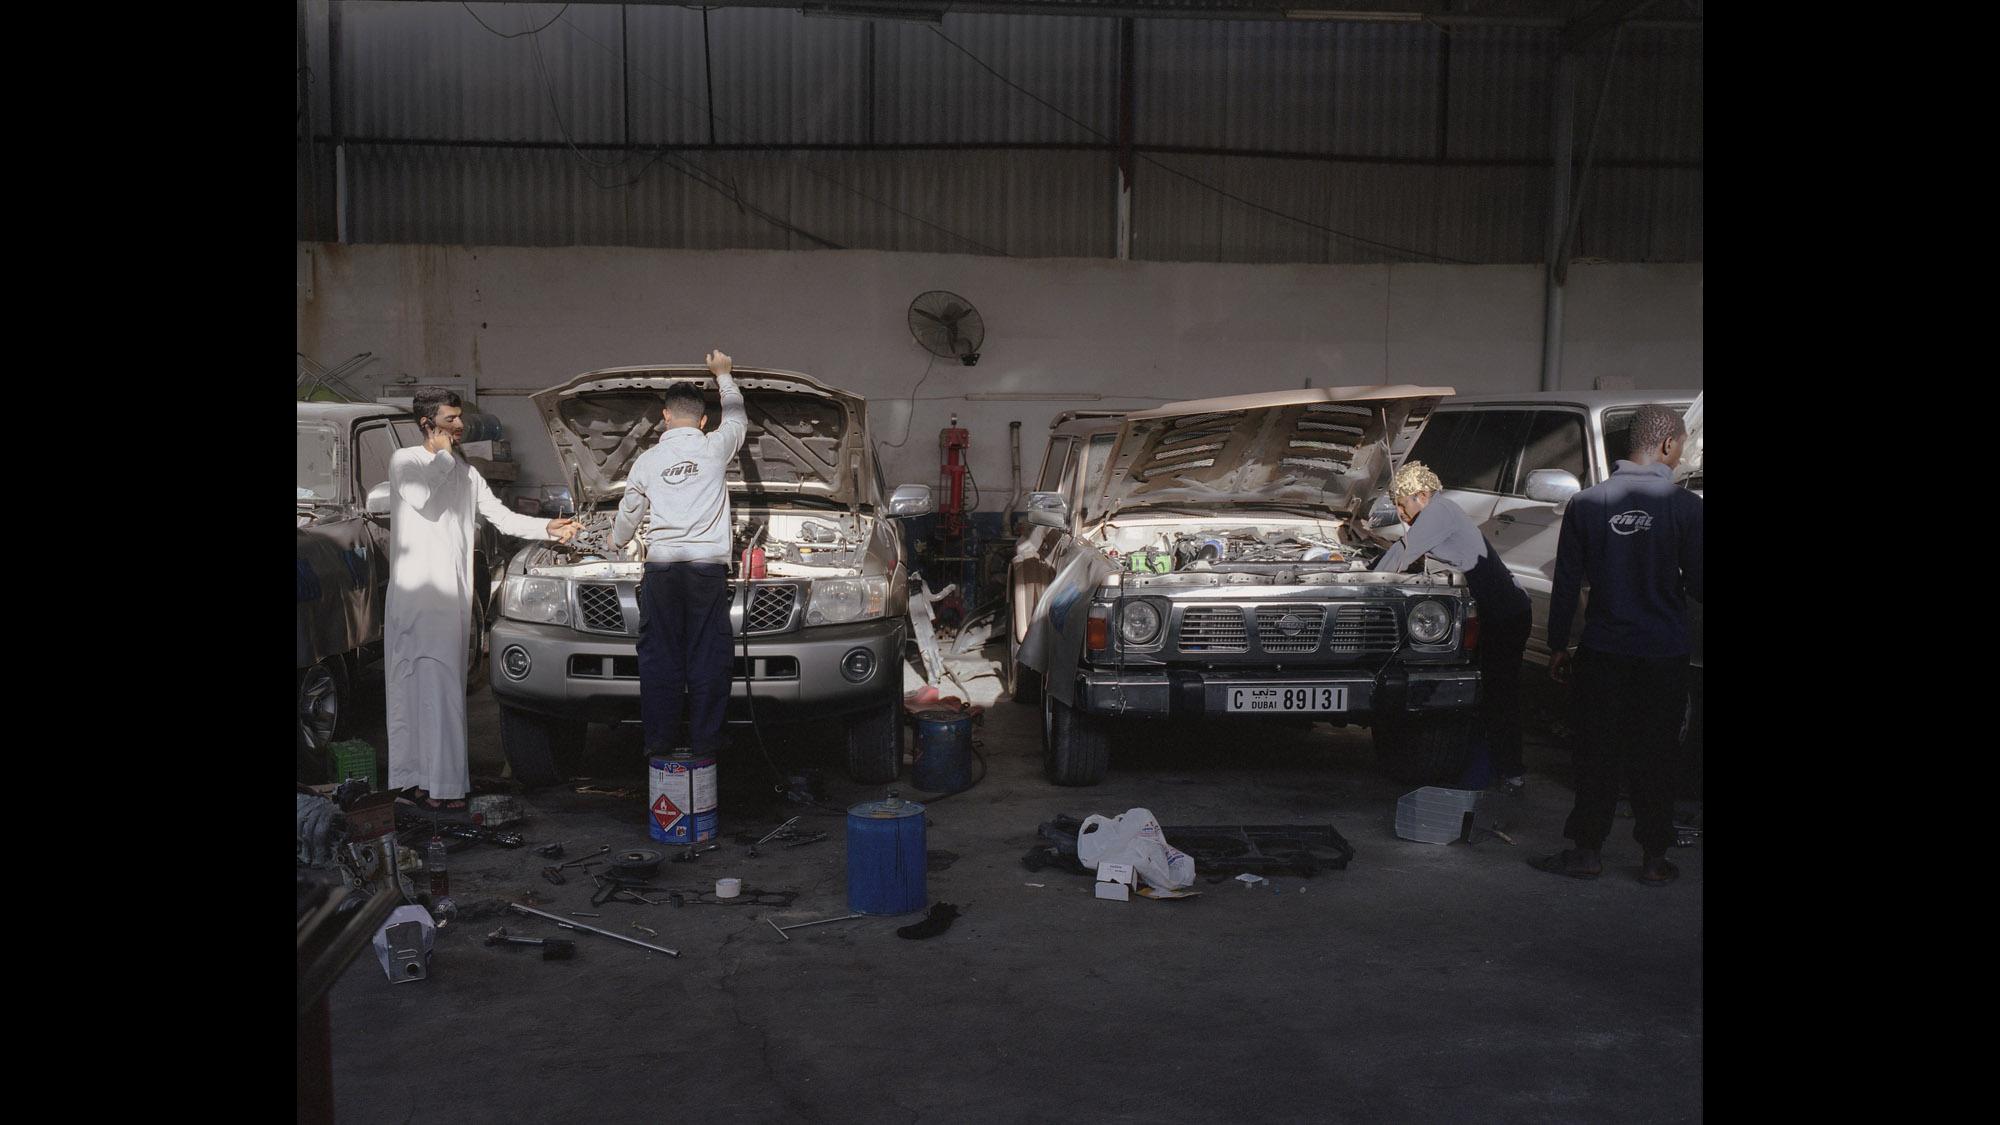 Empire Inc Aka Drift Exotic Boyz Toyoto Jdm Powerfull Motor To Swap